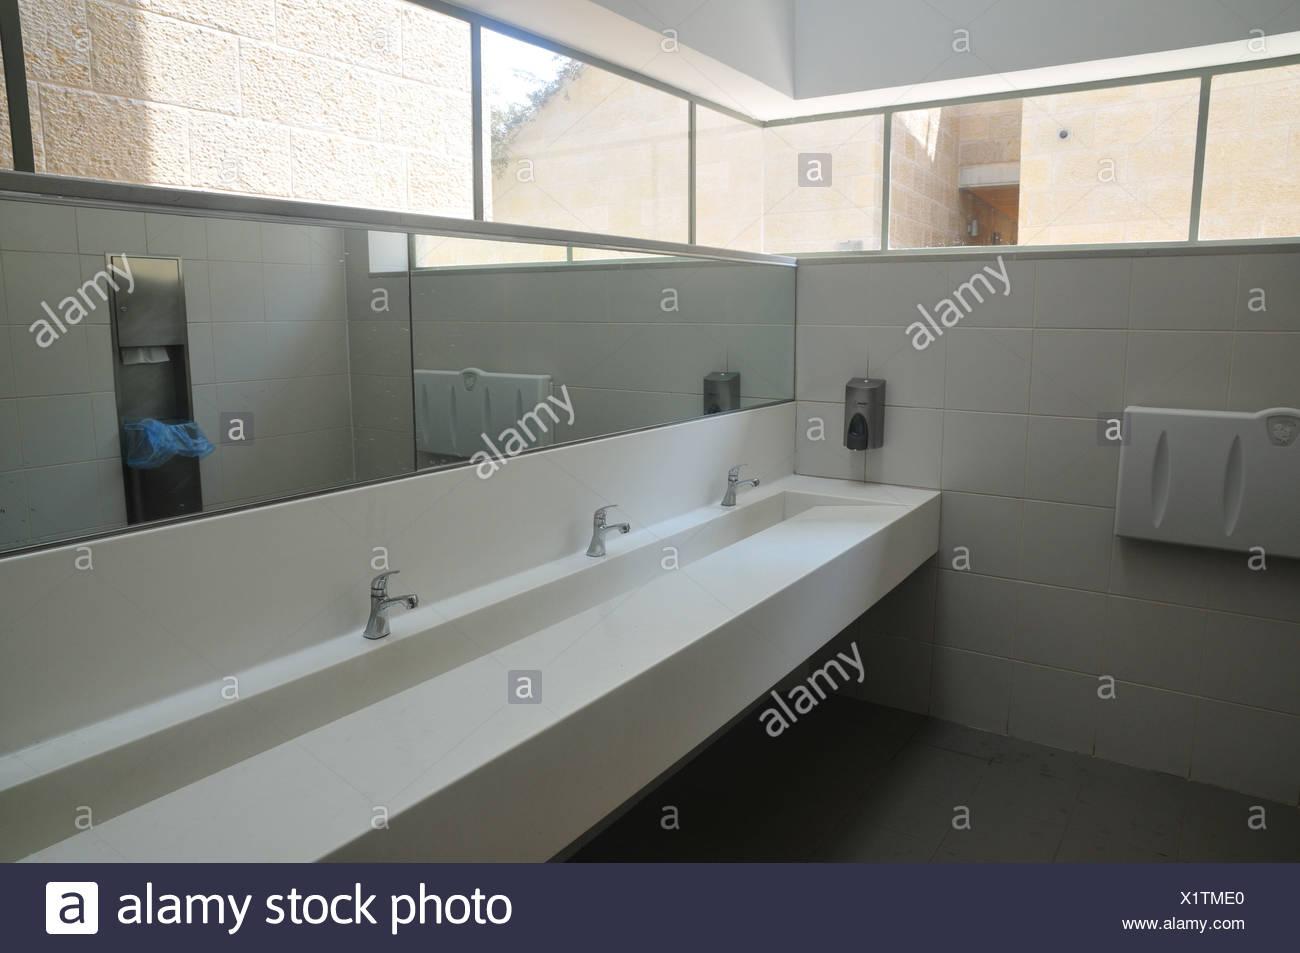 Public Bathroom Stock Photo 276523464 Alamy